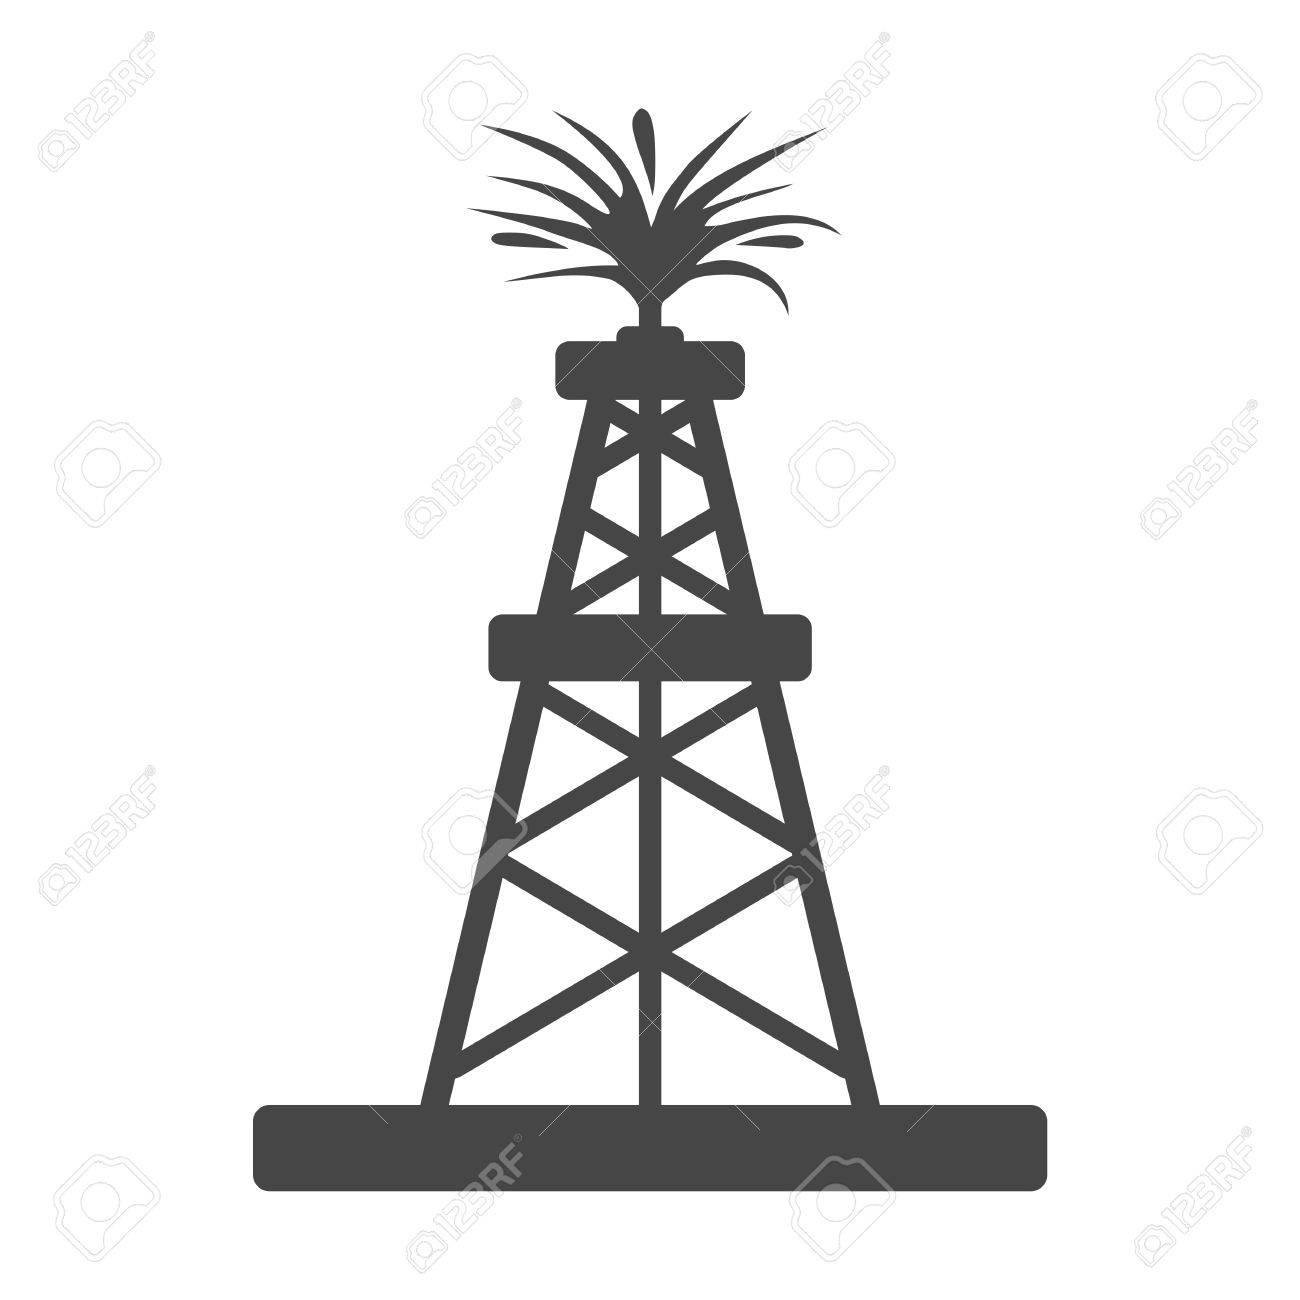 oil rig oil gusher sticker icon royalty free cliparts vectors and rh 123rf com Oil Derrick Clip Art Outline Oil Derrick Clilpart